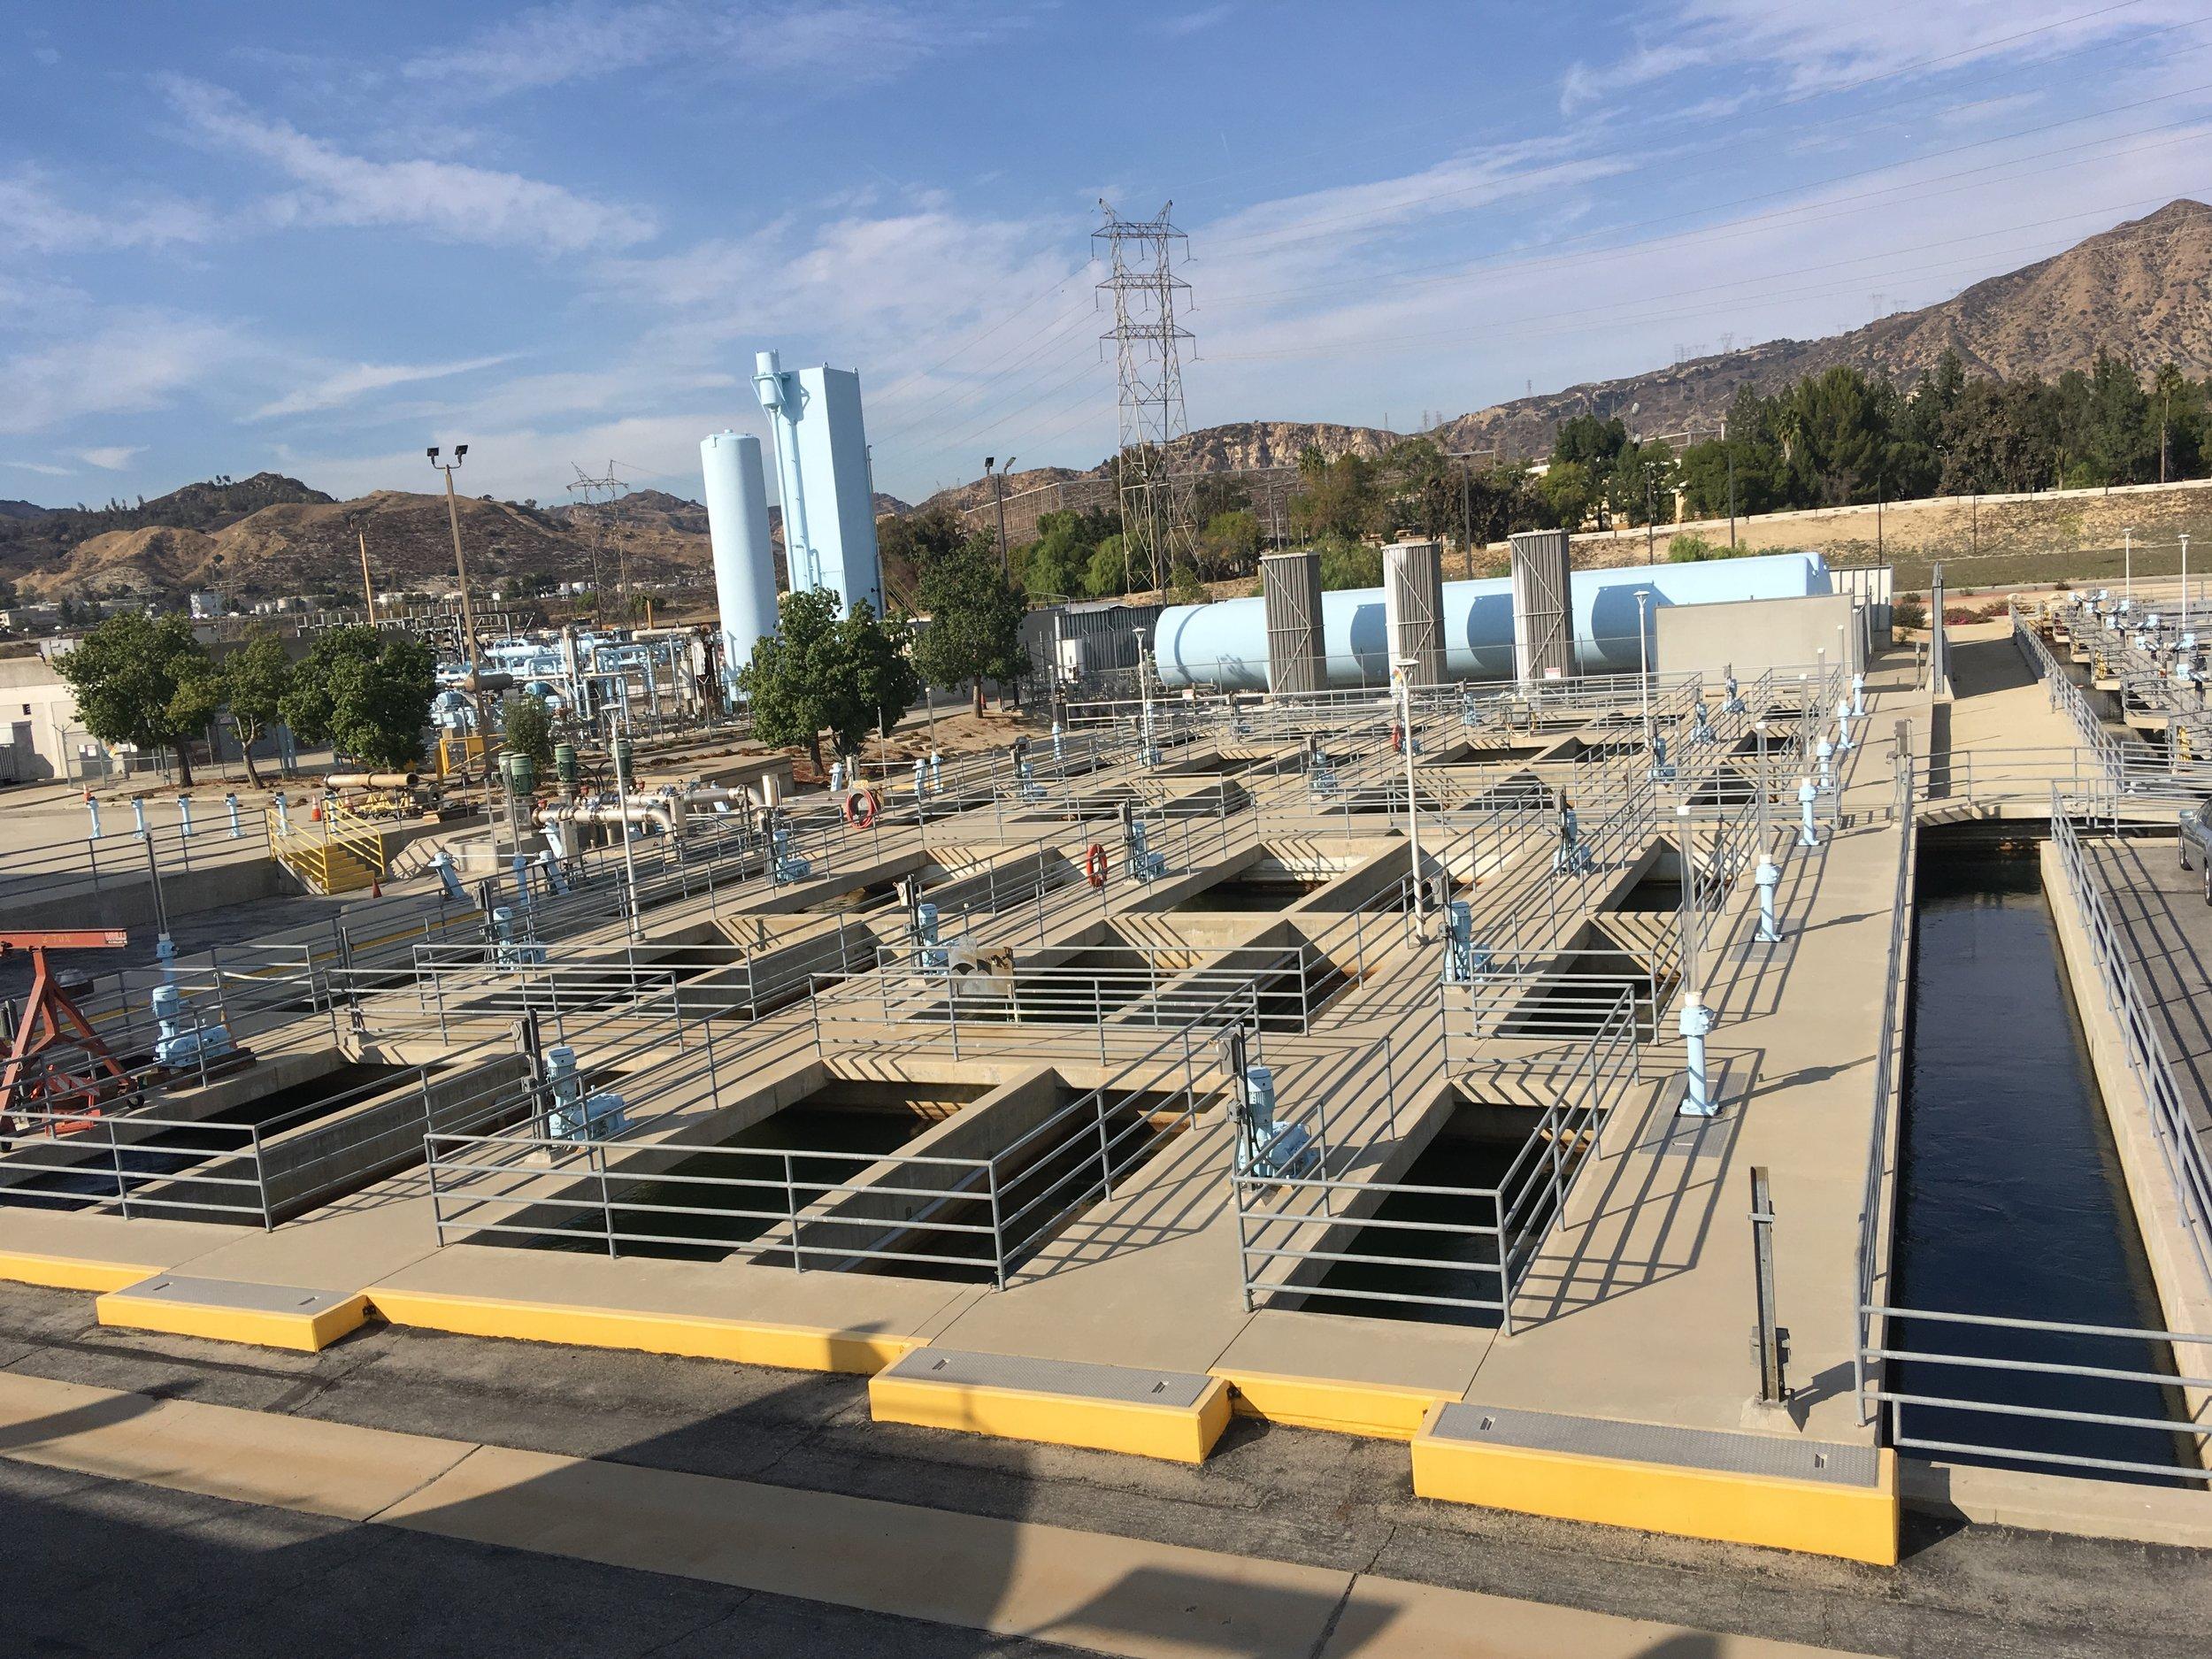 November 16, 2018: Field lab site visit to LADWP Aqueduct Filtration Plant